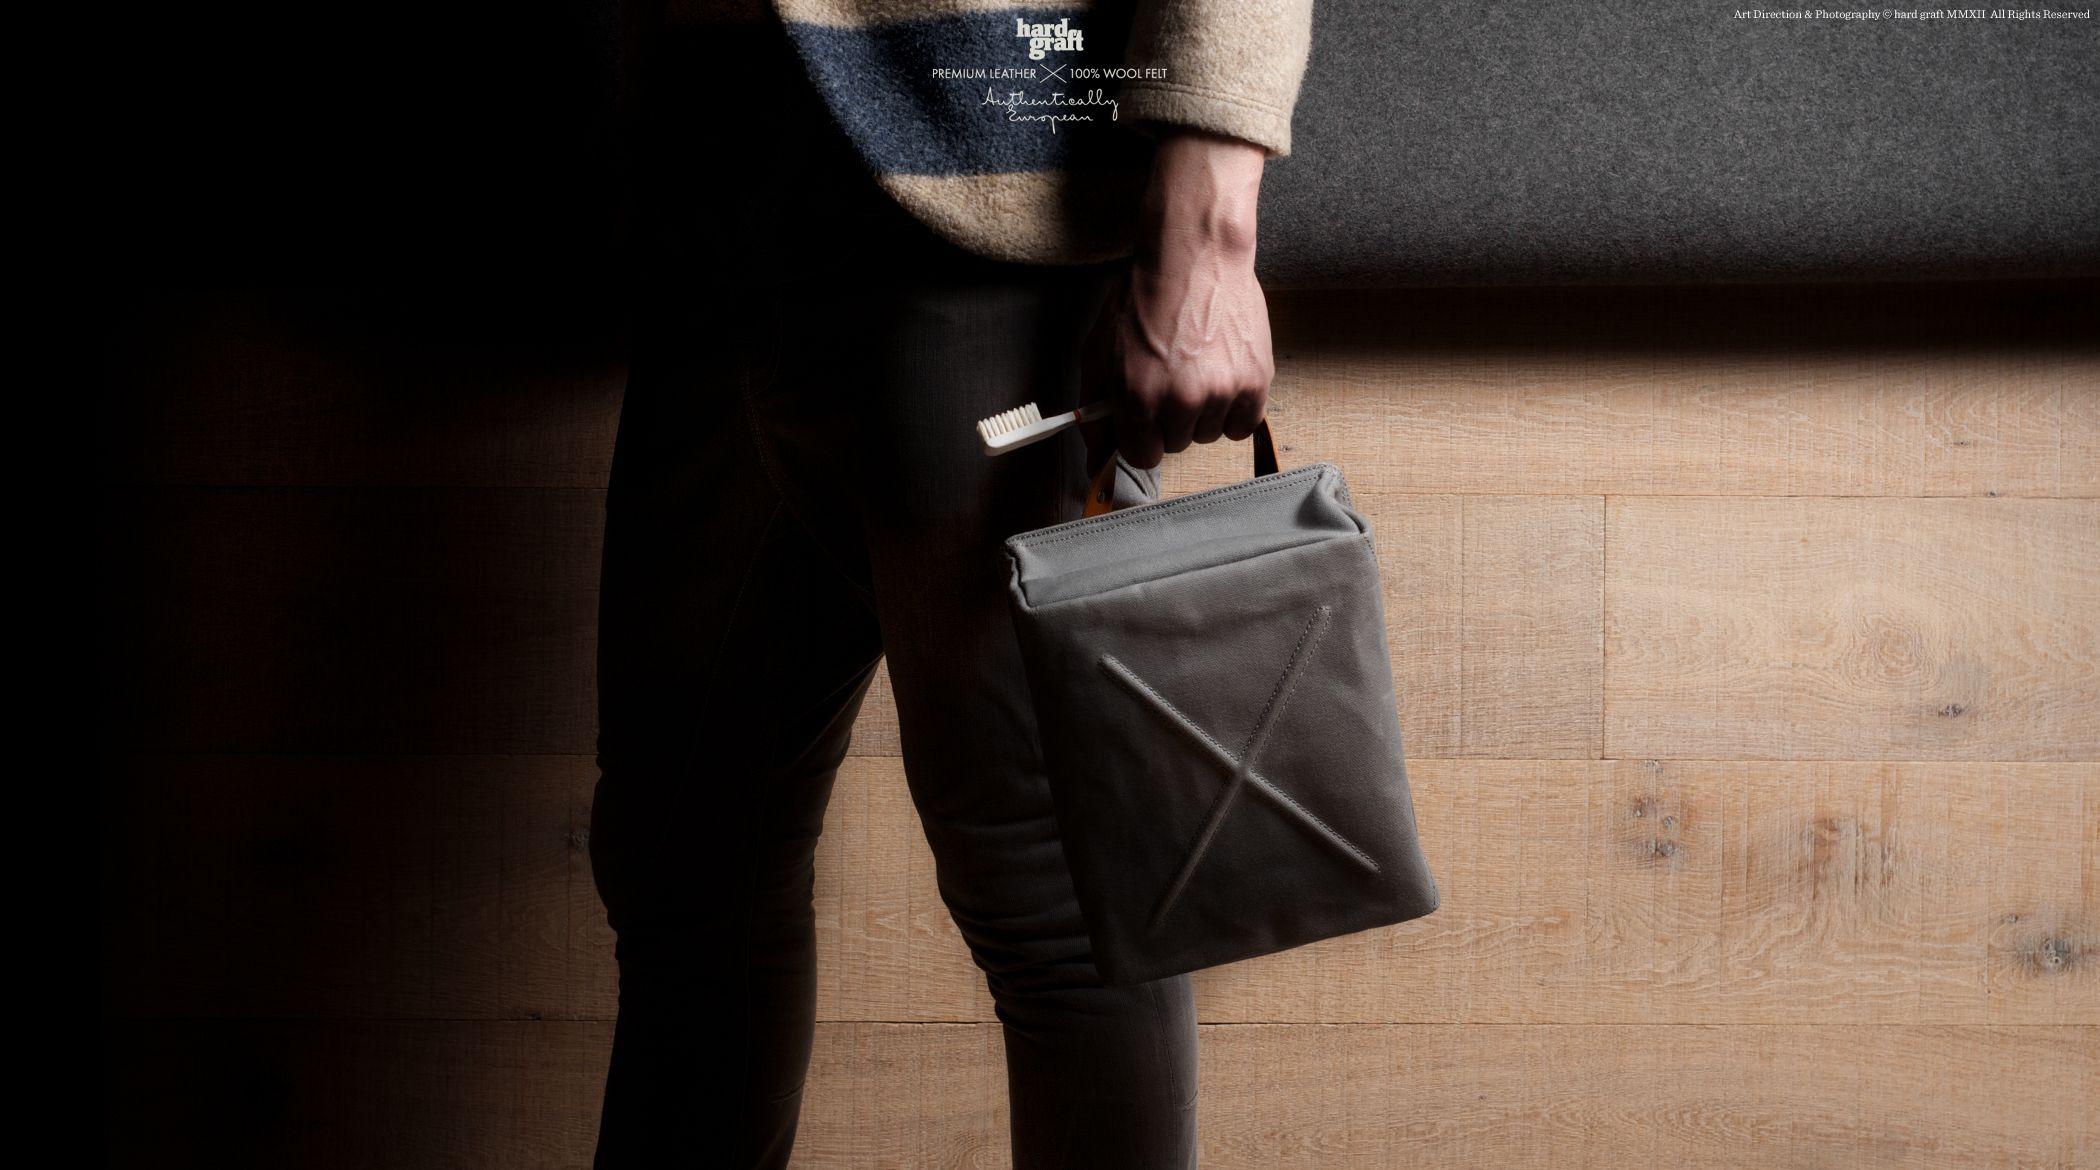 #HardGraft #canvas #leather #doppkit #bag